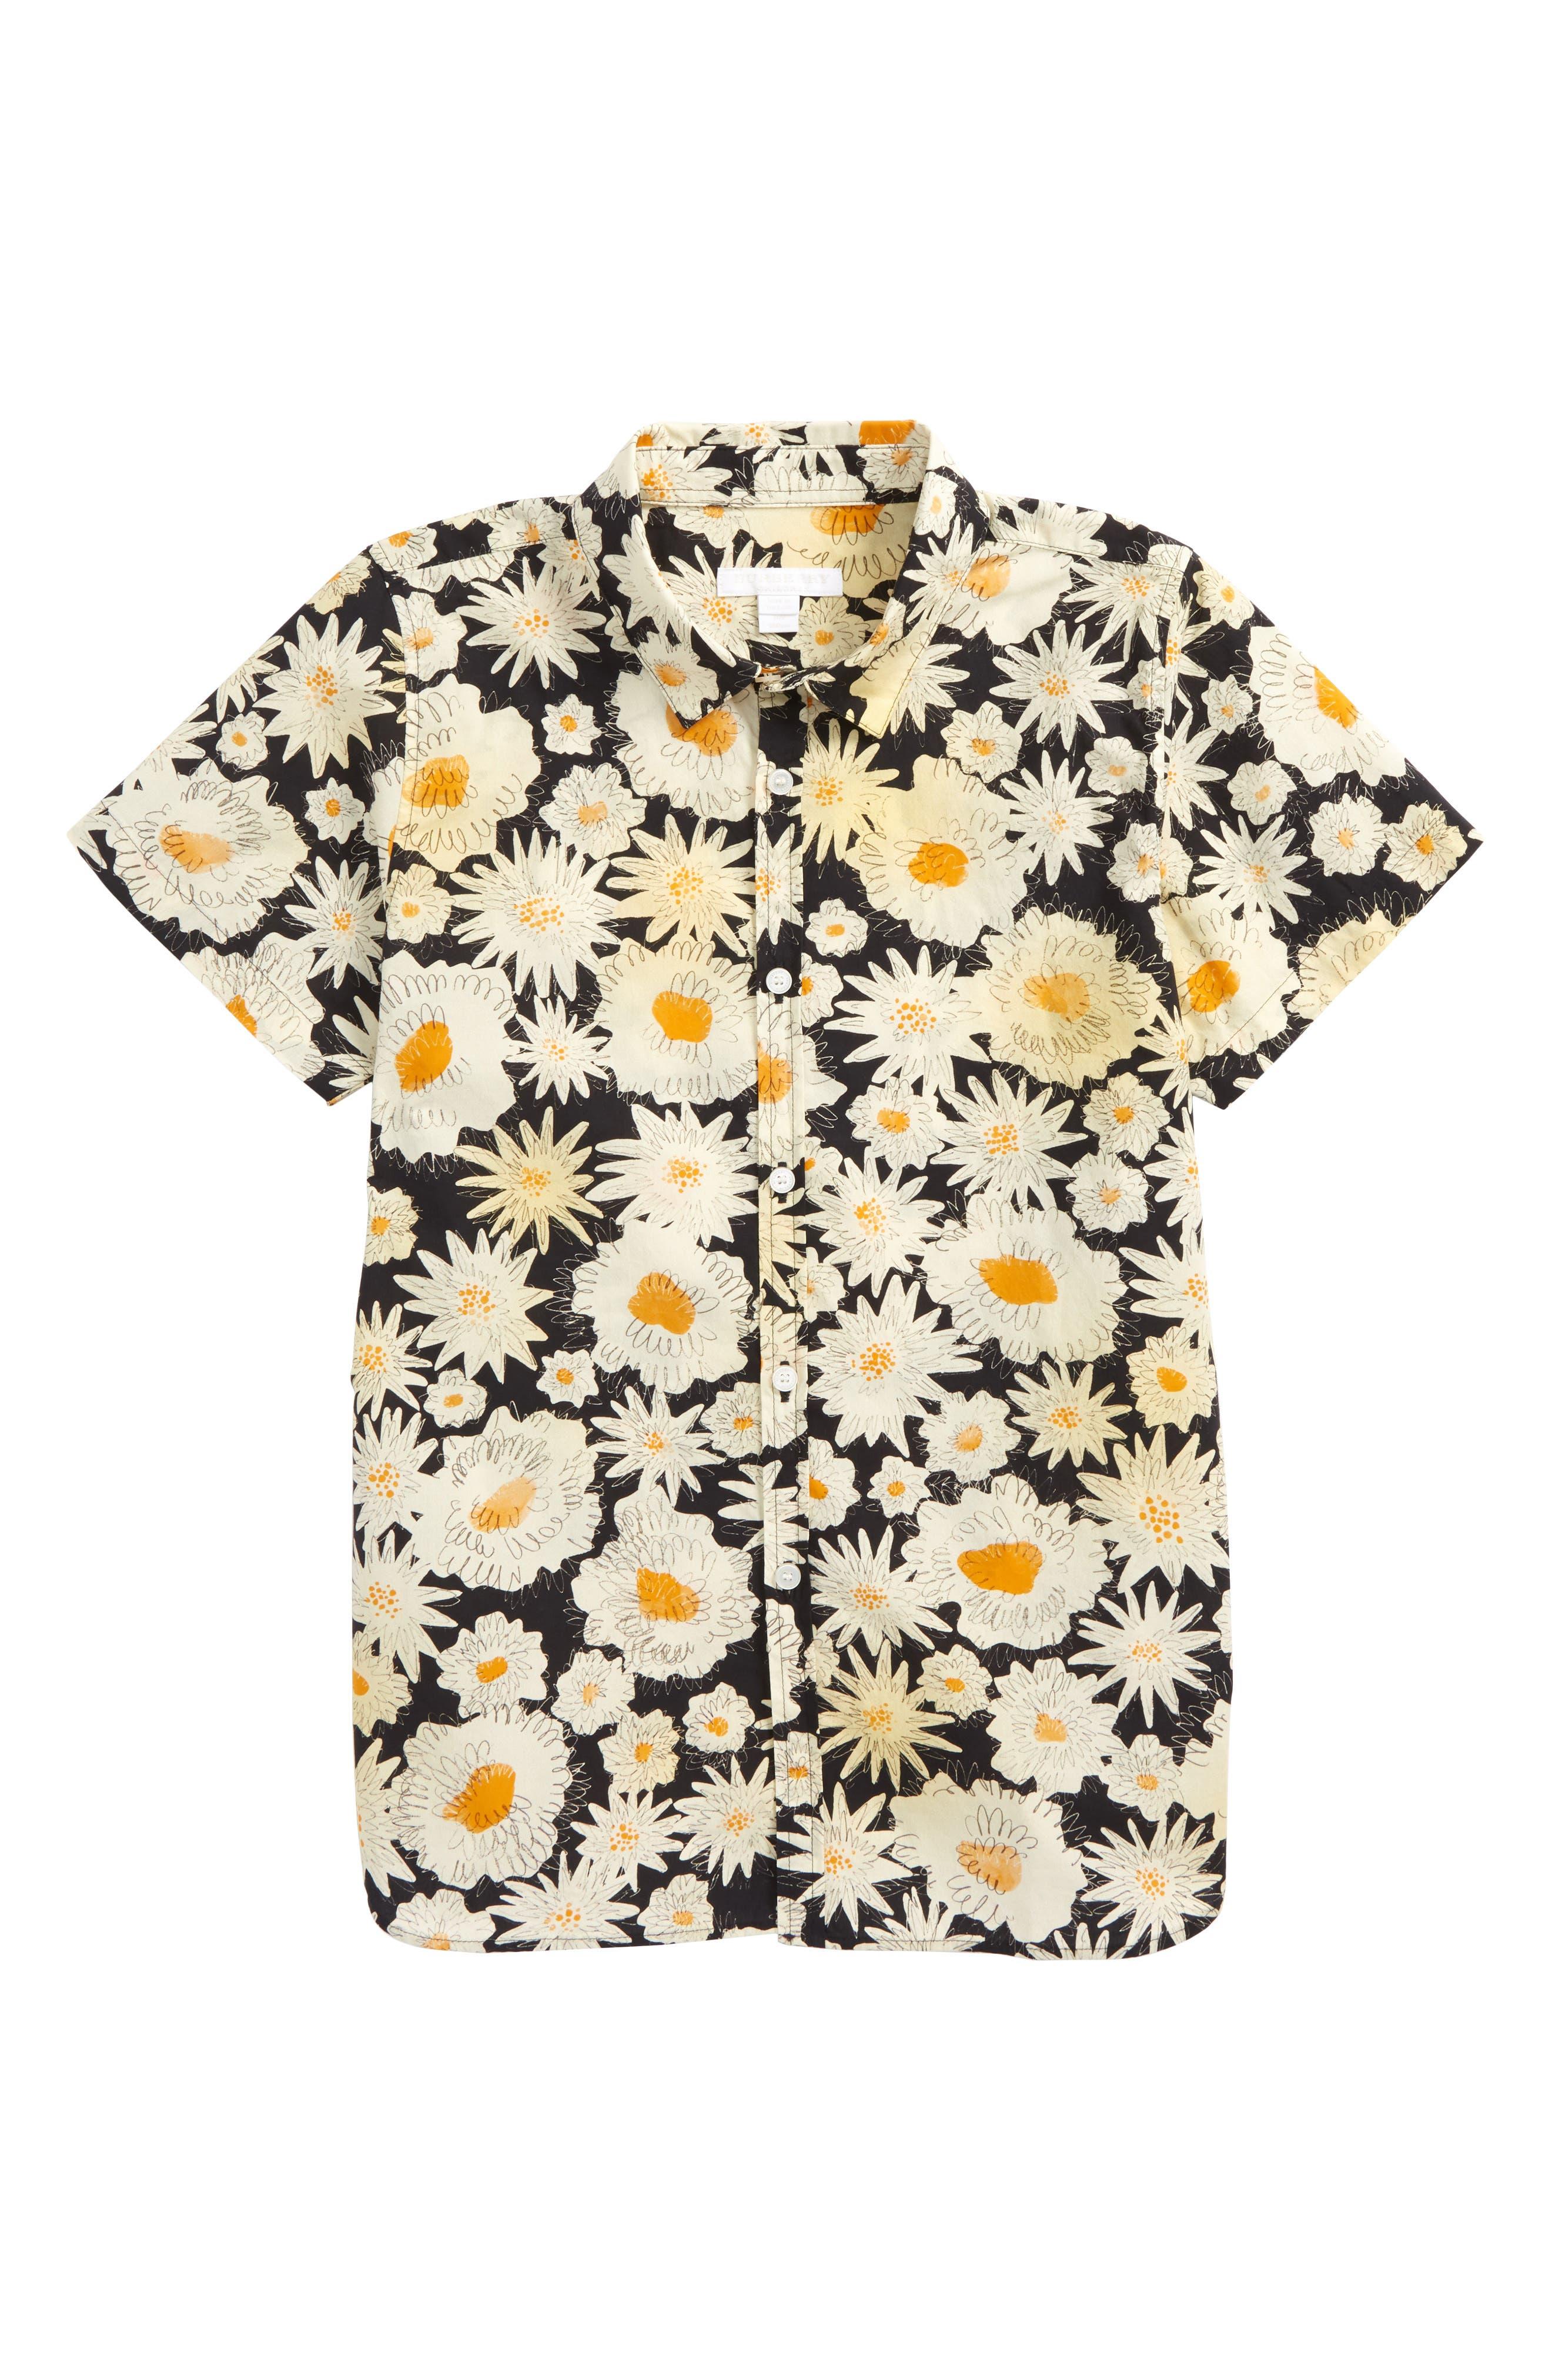 Clarkey Woven Shirt,                             Main thumbnail 1, color,                             Black